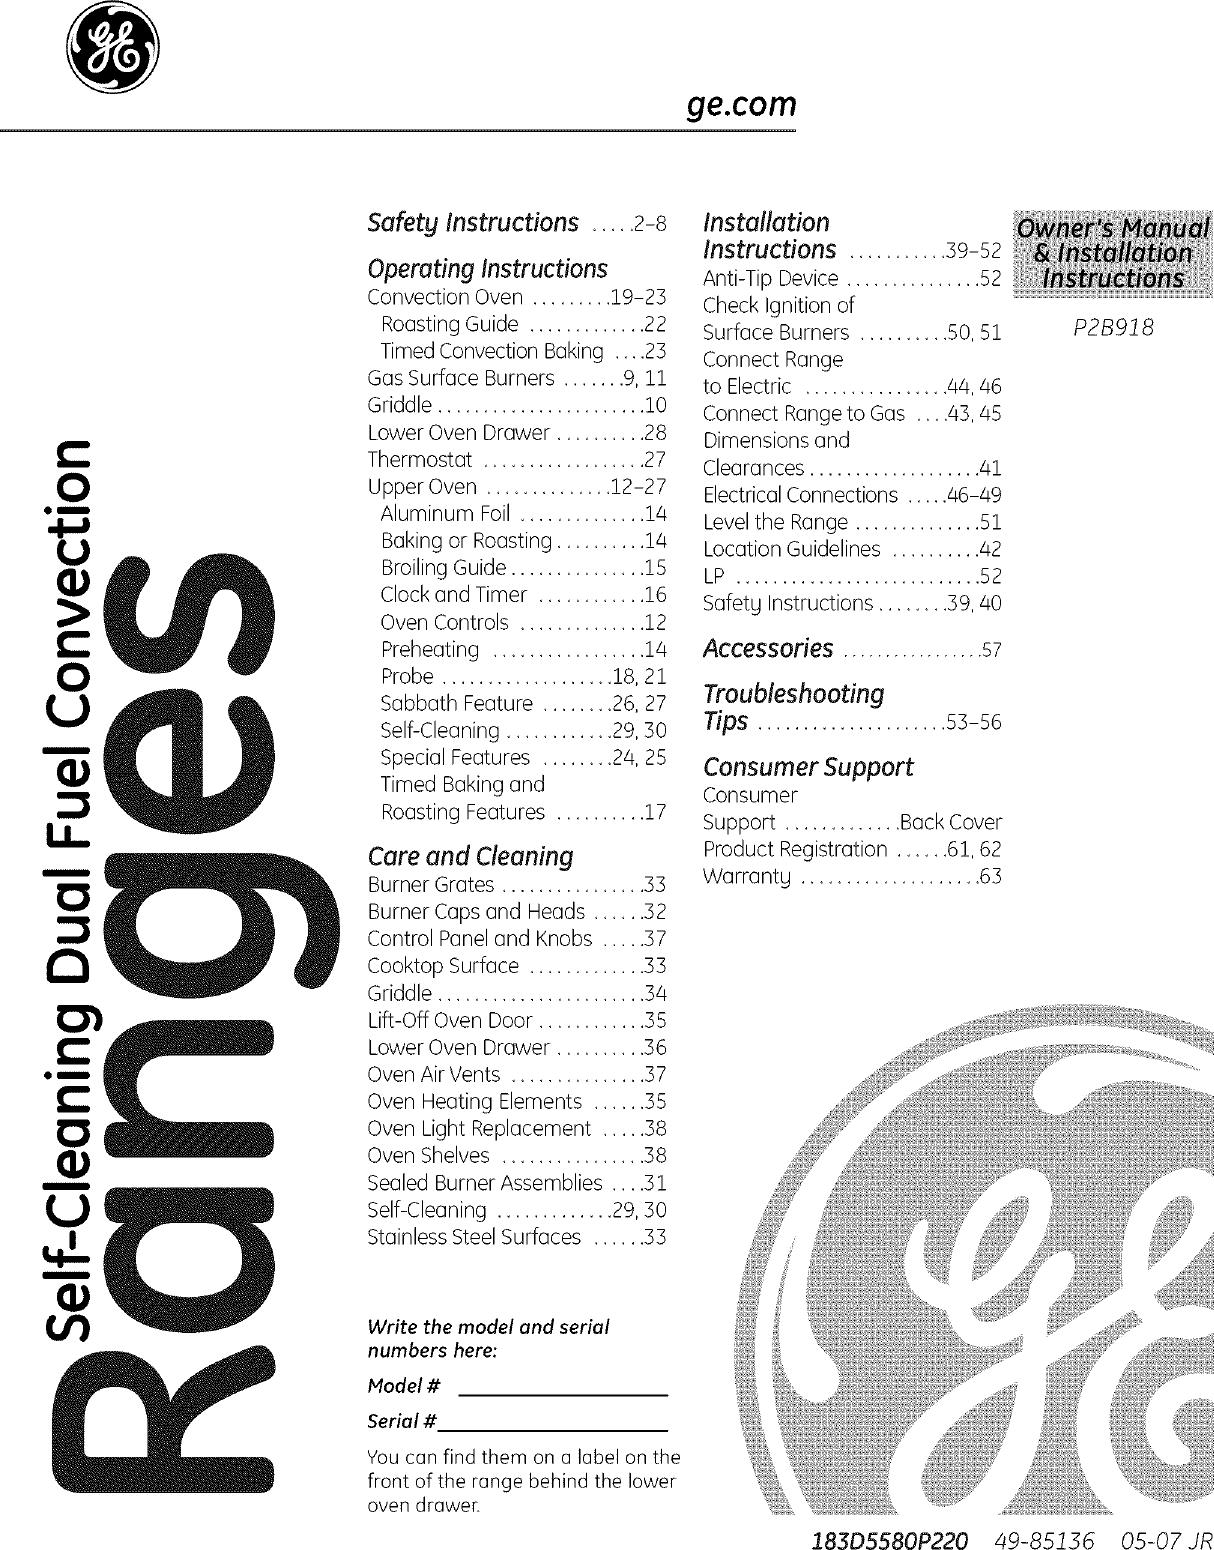 GE Range, Electric/Gas Manual L0707048